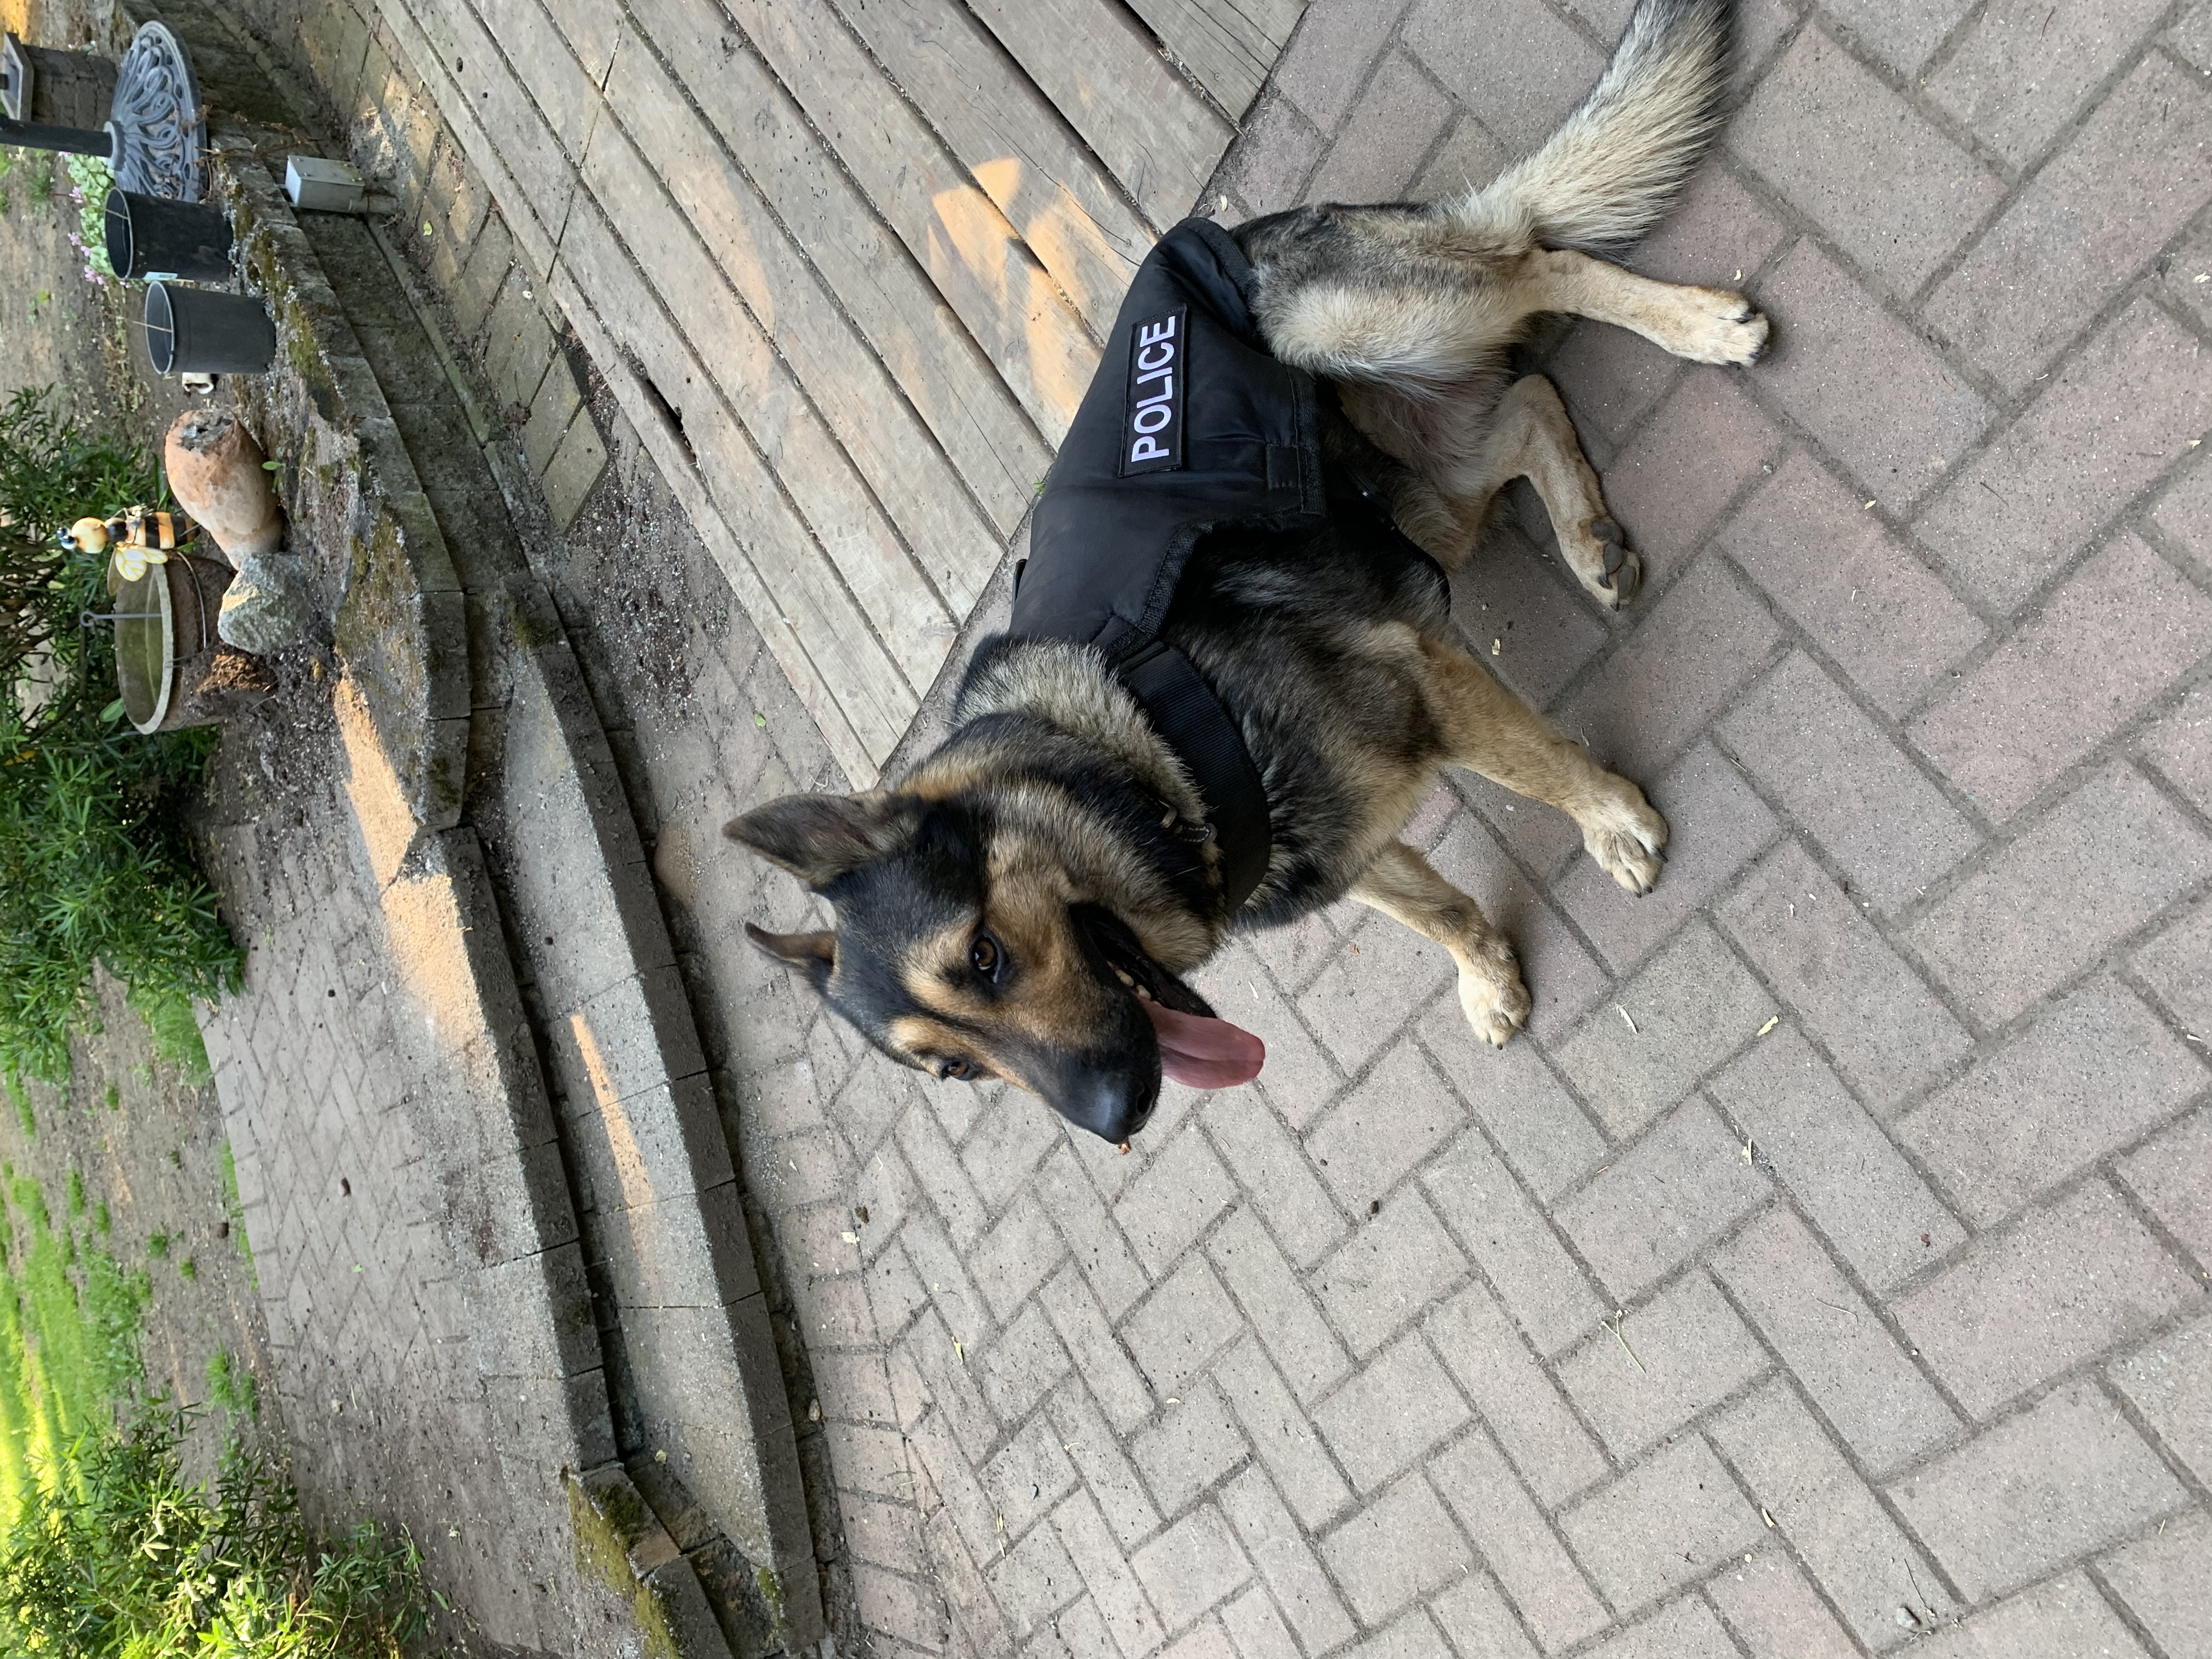 Large size canine unit police vest